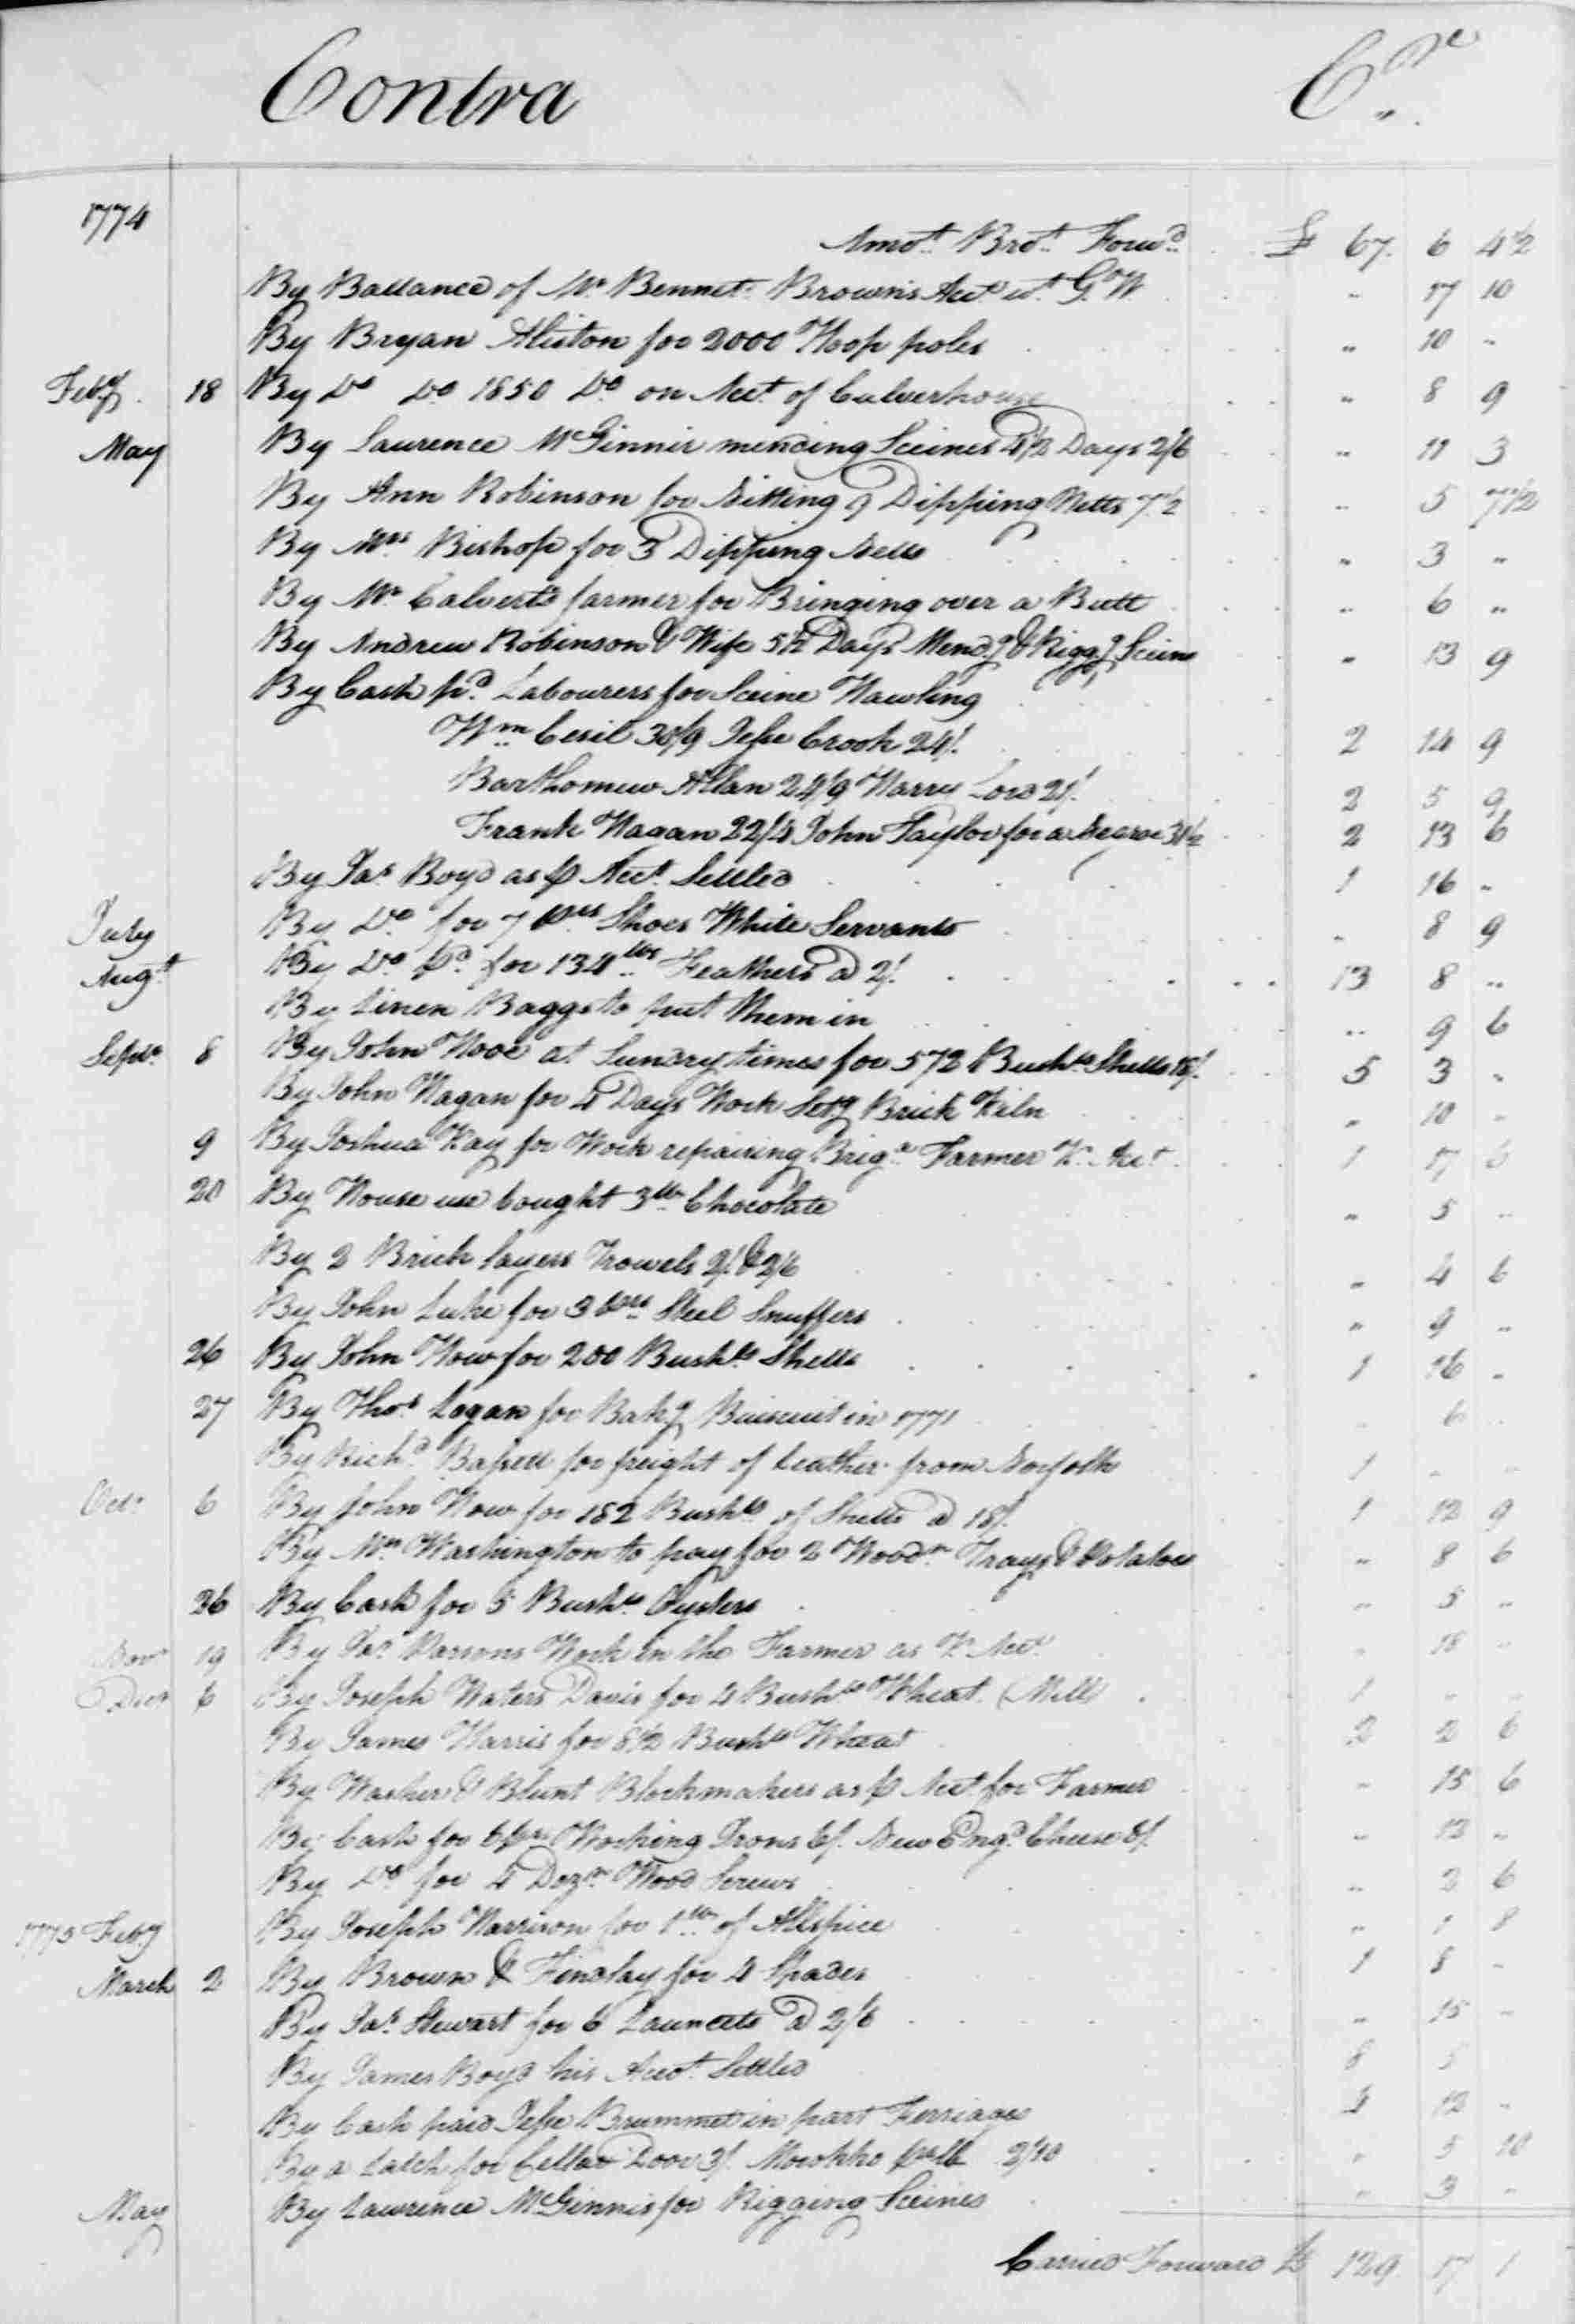 Ledger B, folio 141, right side